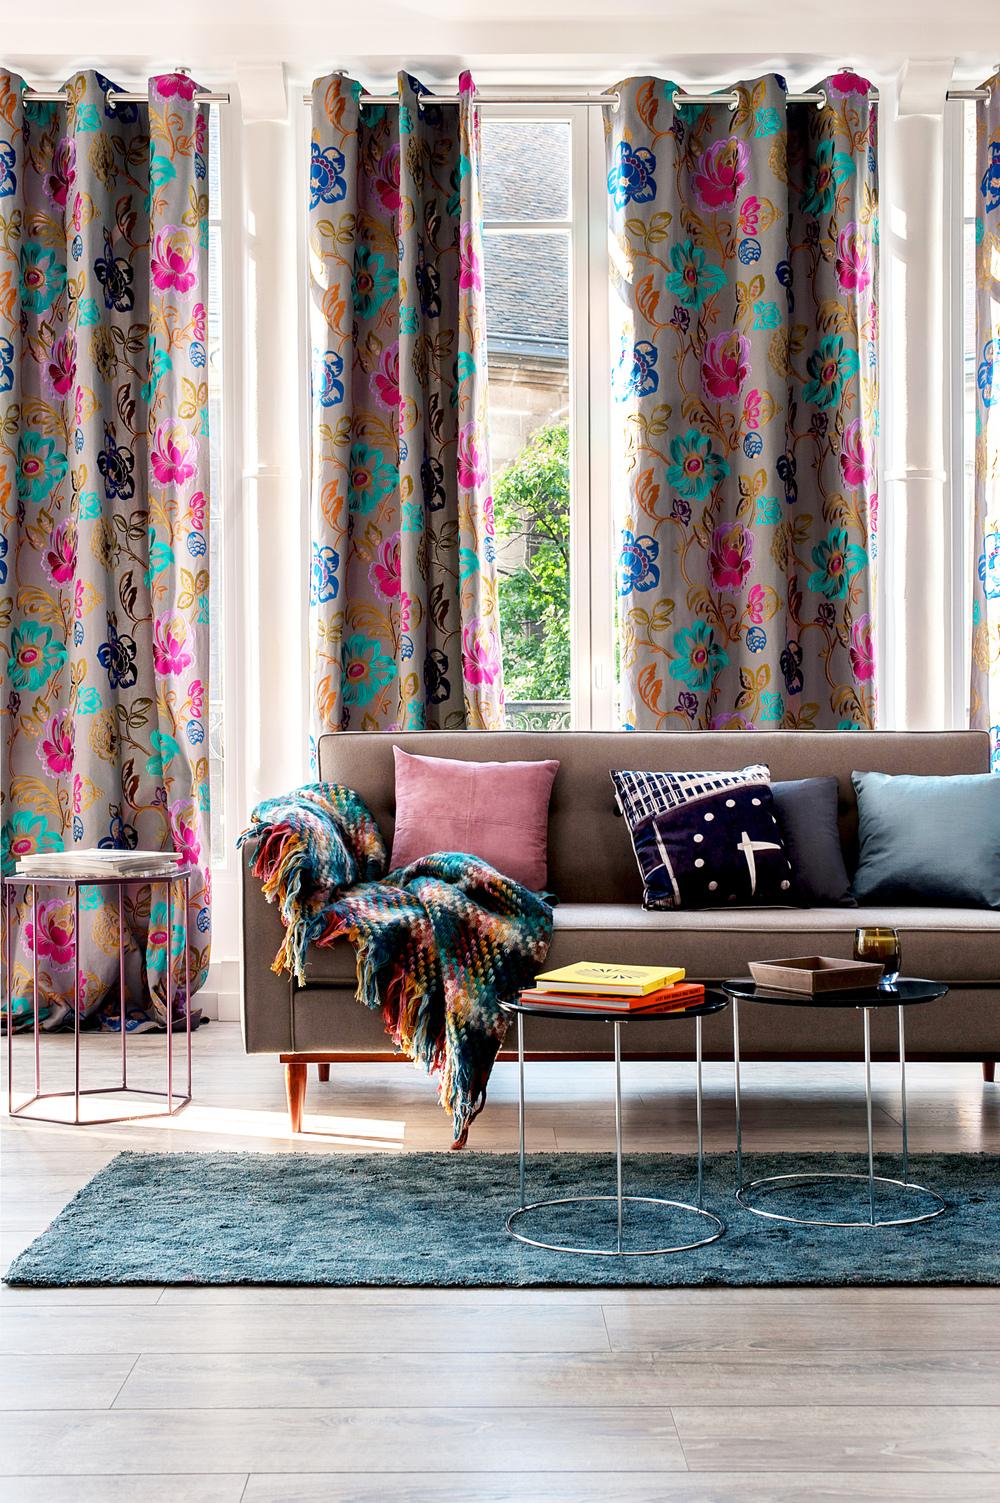 Madura hong kong first haute couture home d cor maison merci media - Blog couture deco maison ...